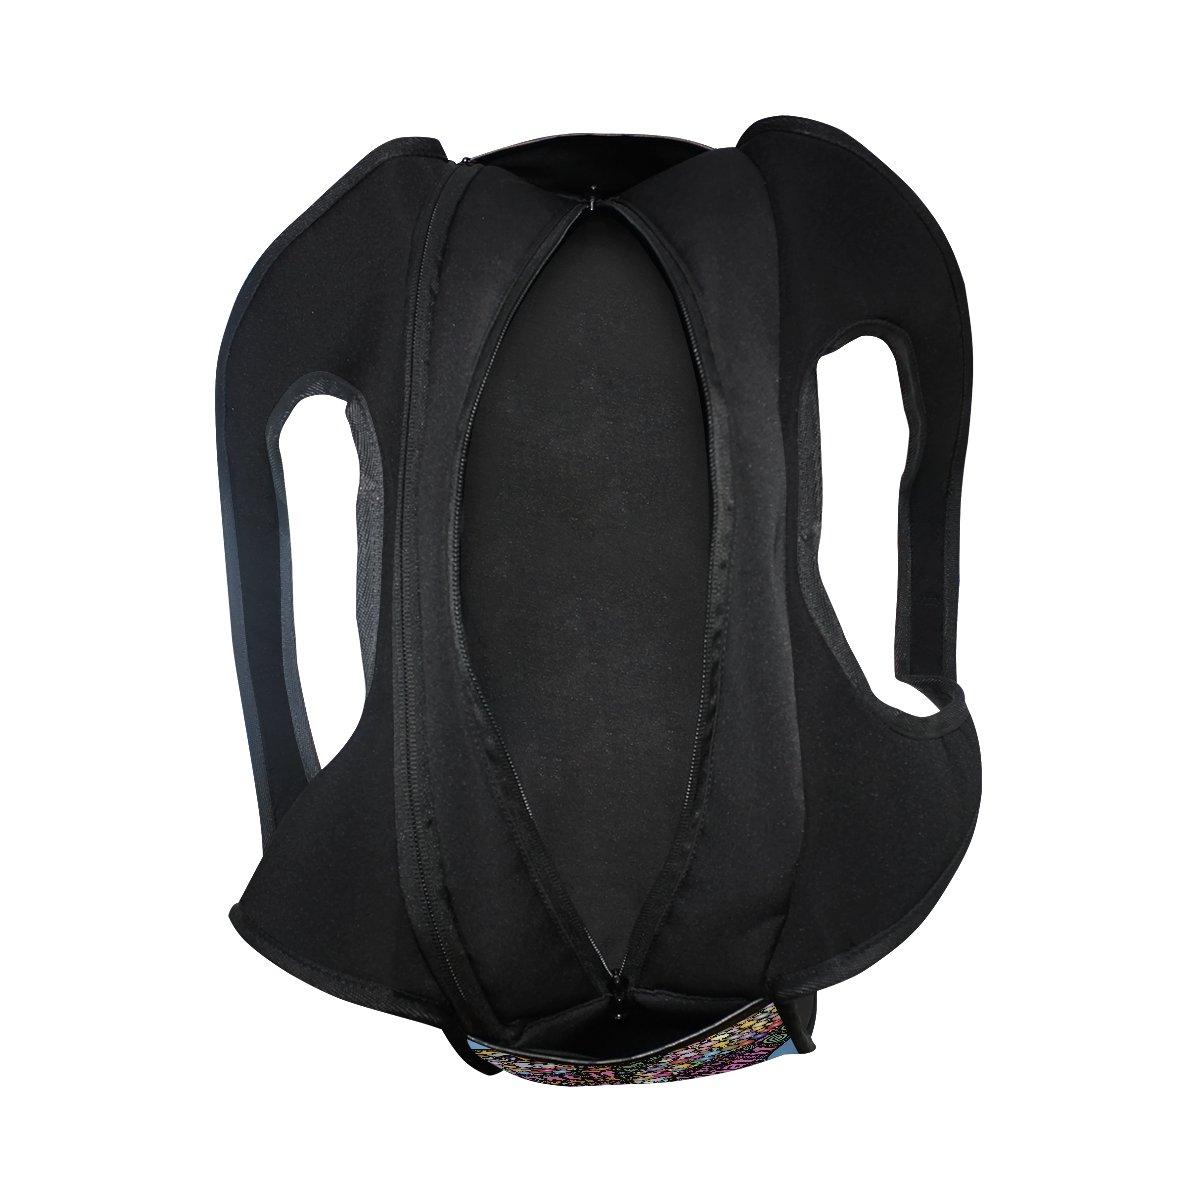 AHOMY Sports Gym Bag Head Character Duffel Bag Travel Shoulder Bag